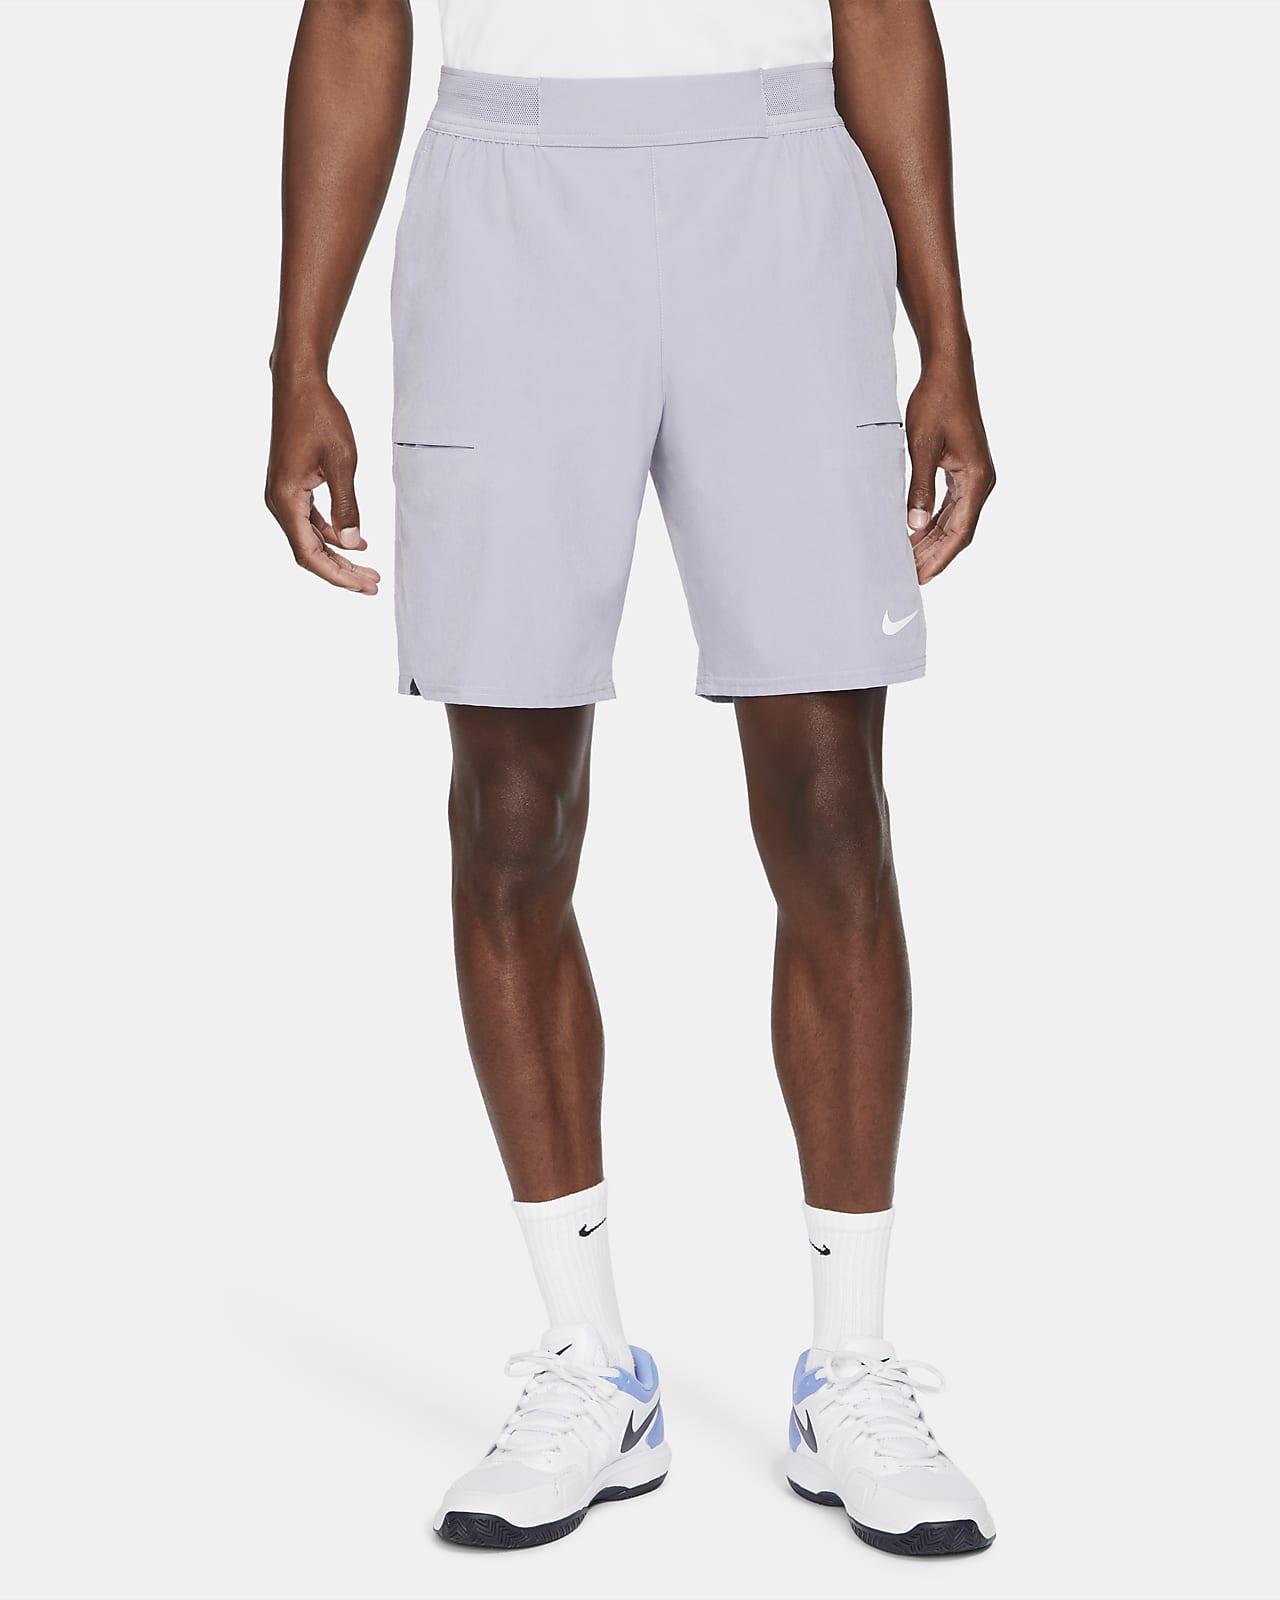 Shorts da tennis 23 cm NikeCourt Dri-FIT Advantage - Uomo